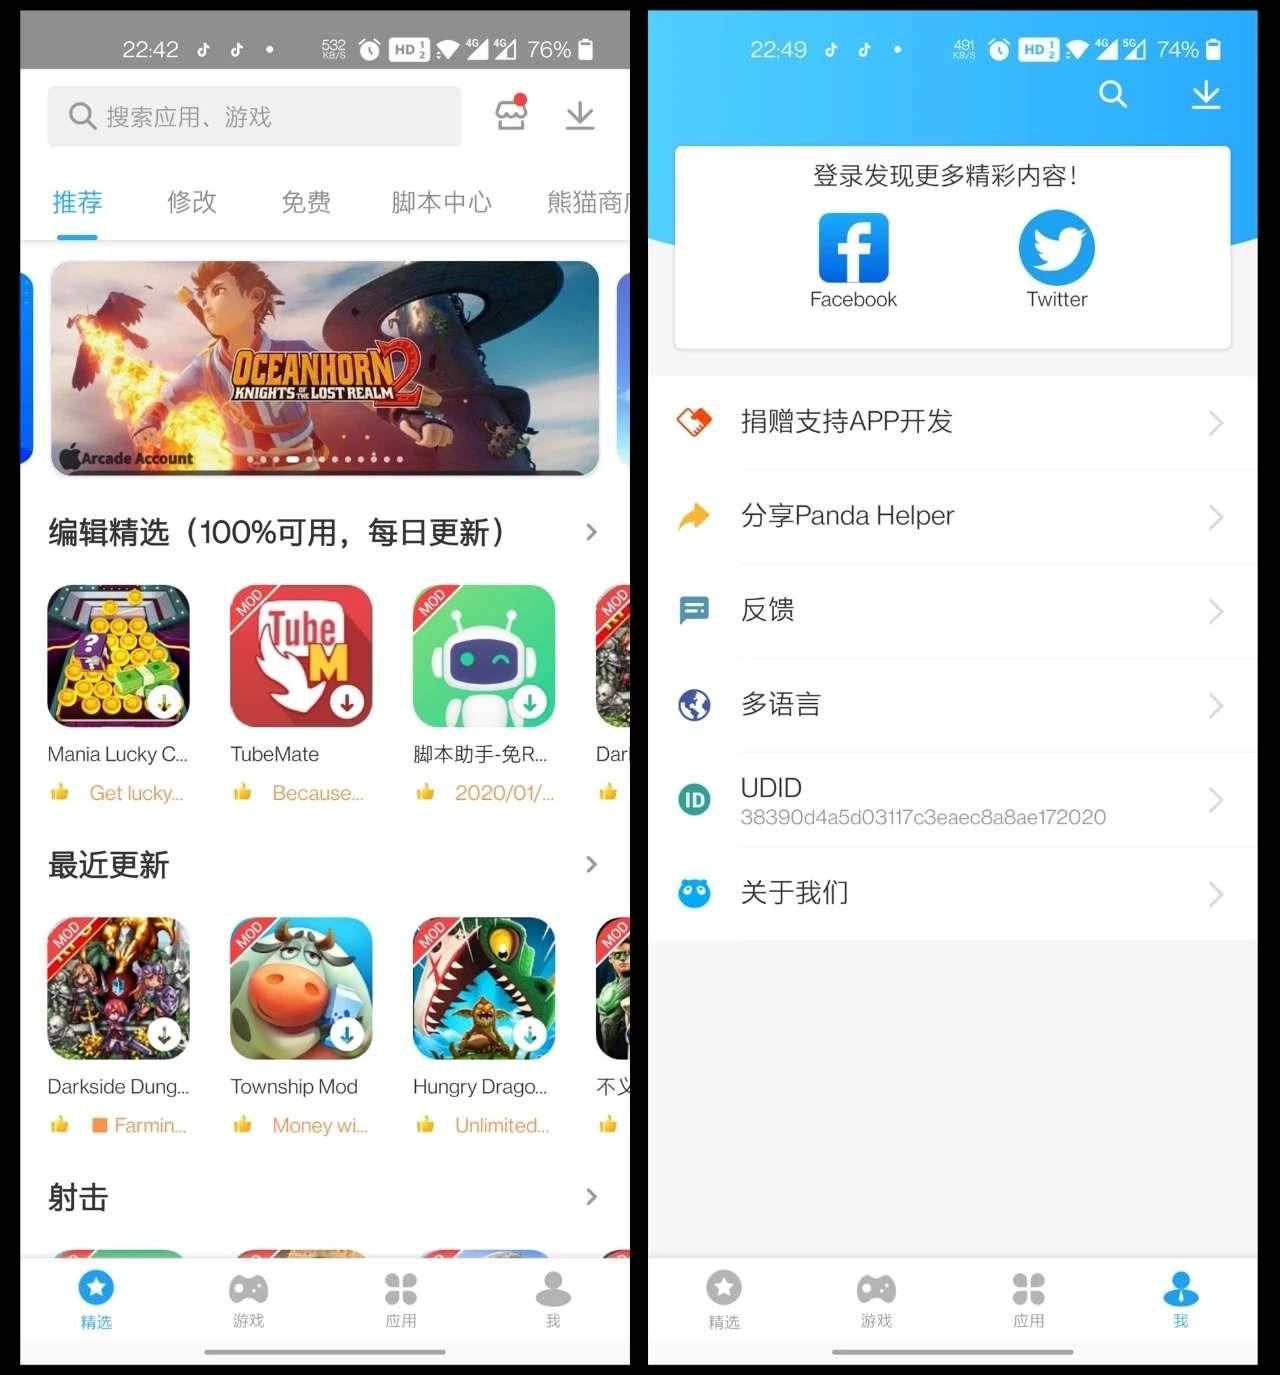 Android无需翻墙即可高速下载国外应用